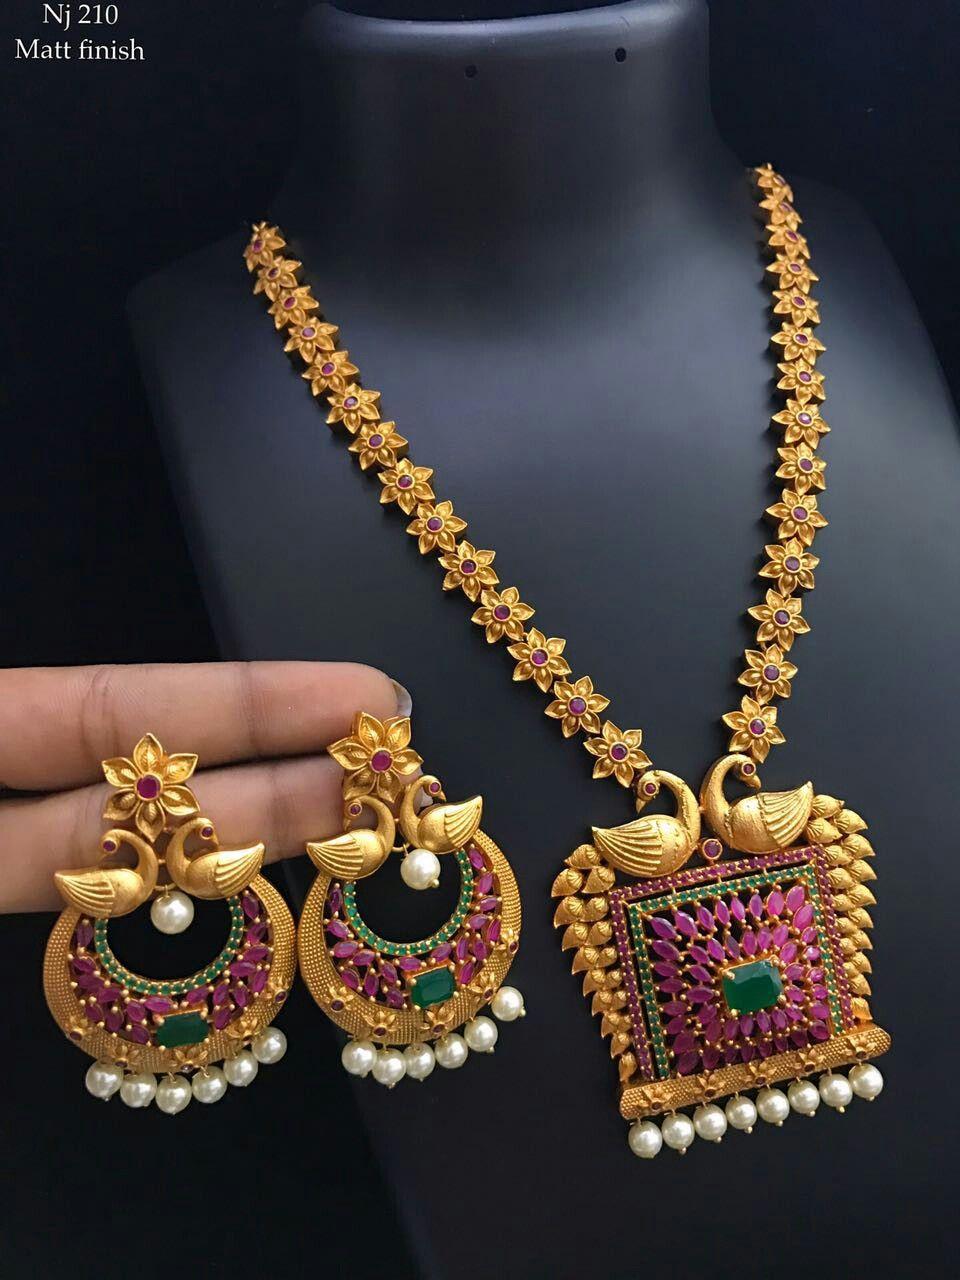 Pin by gloria simon on ruby jewelery pinterest india jewelry